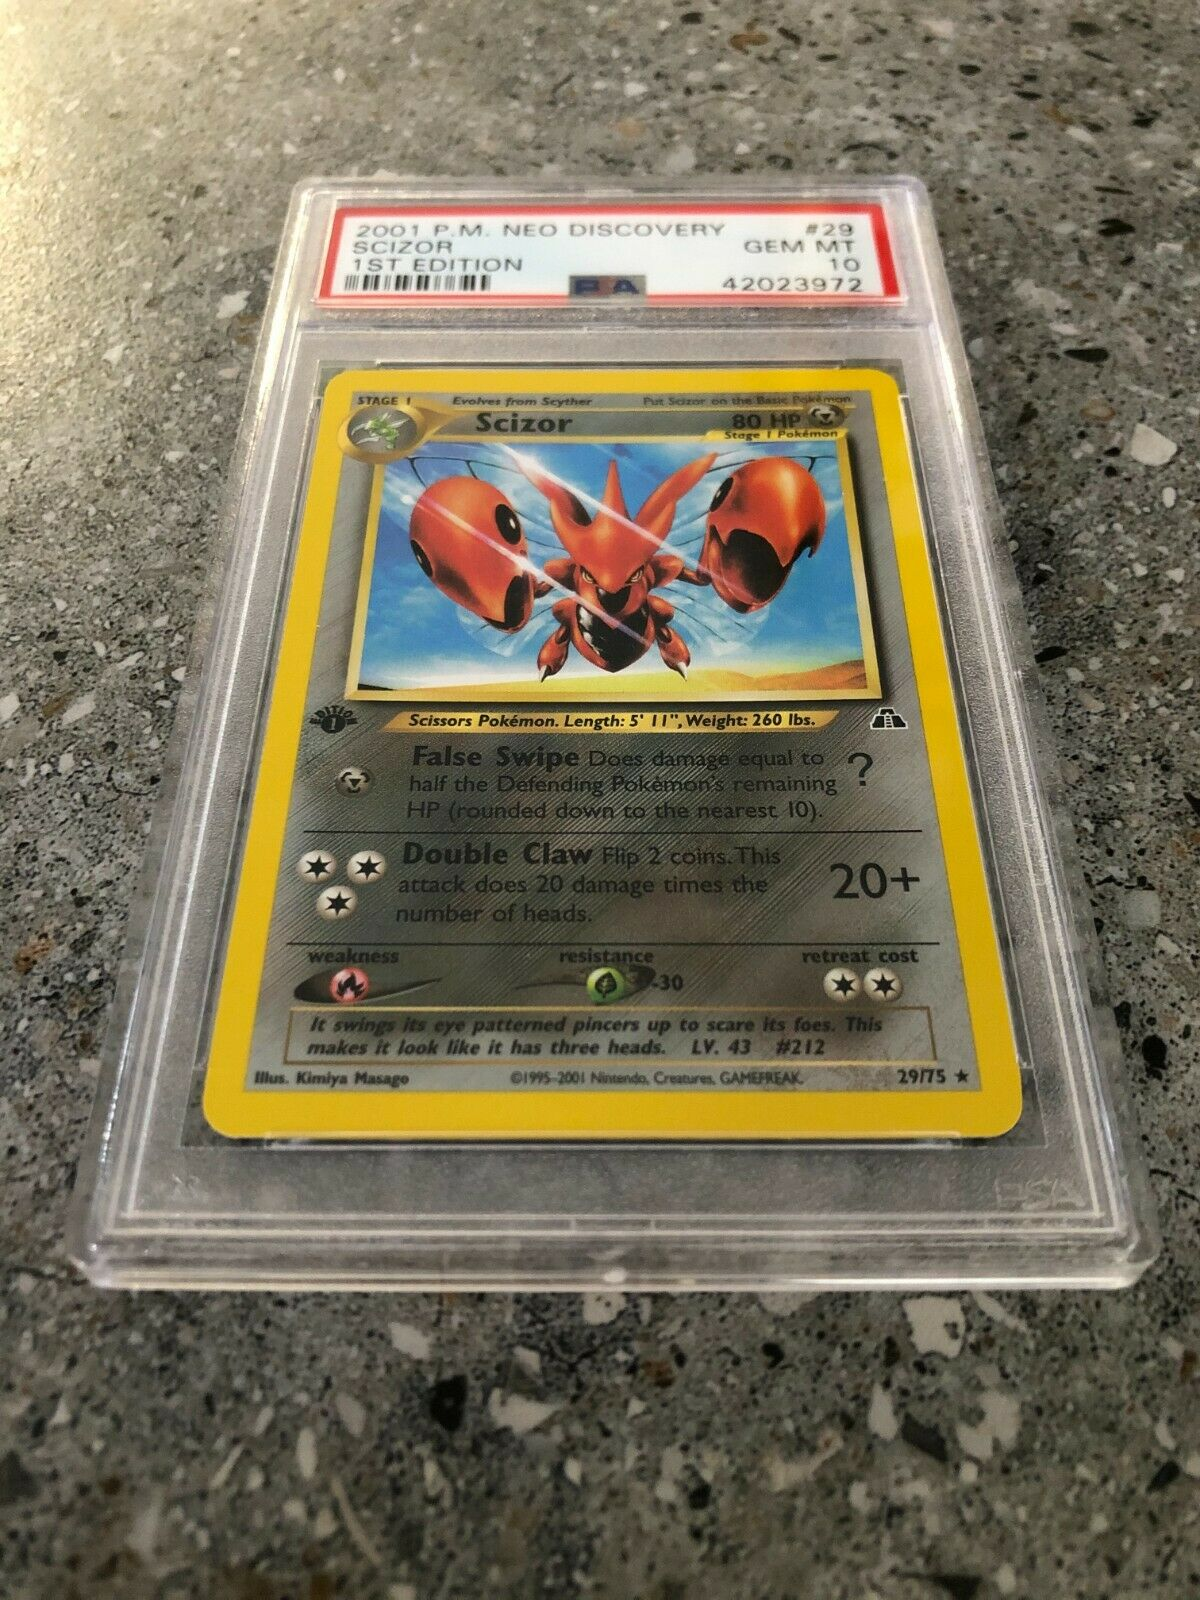 Pokemon TCG Cards 1st Edition Scizor 29/75 Neo Discovery Rare PSA 10 GEM MT - Image 2